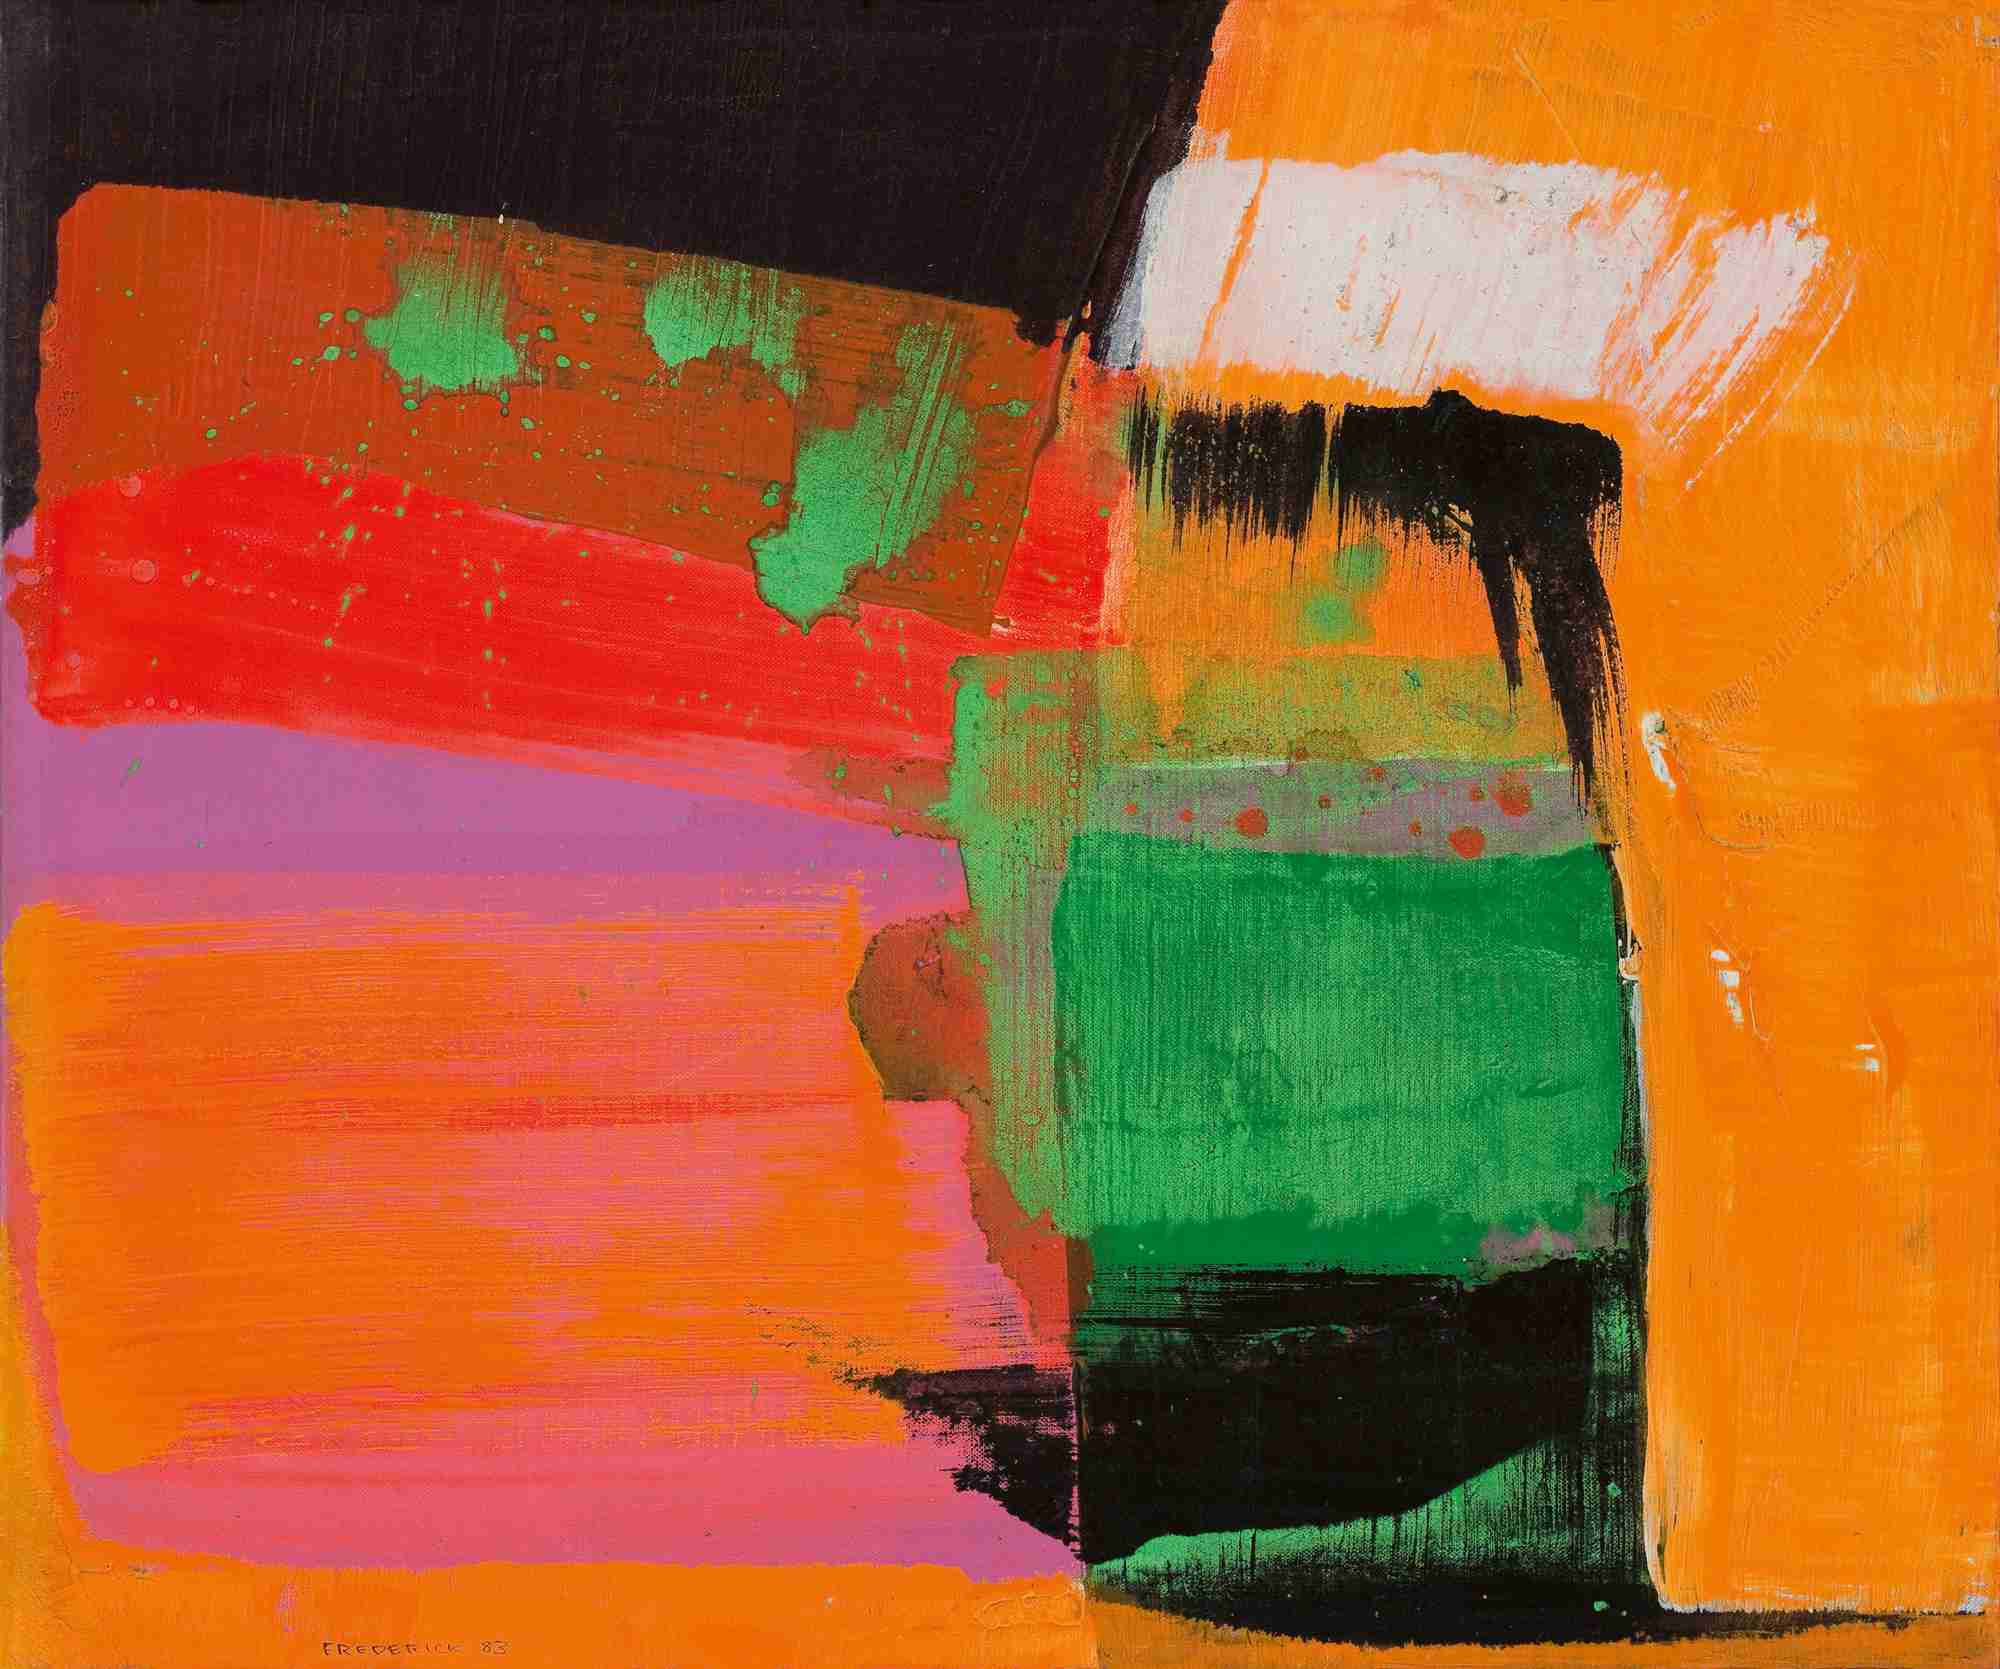 Untitled, 1983